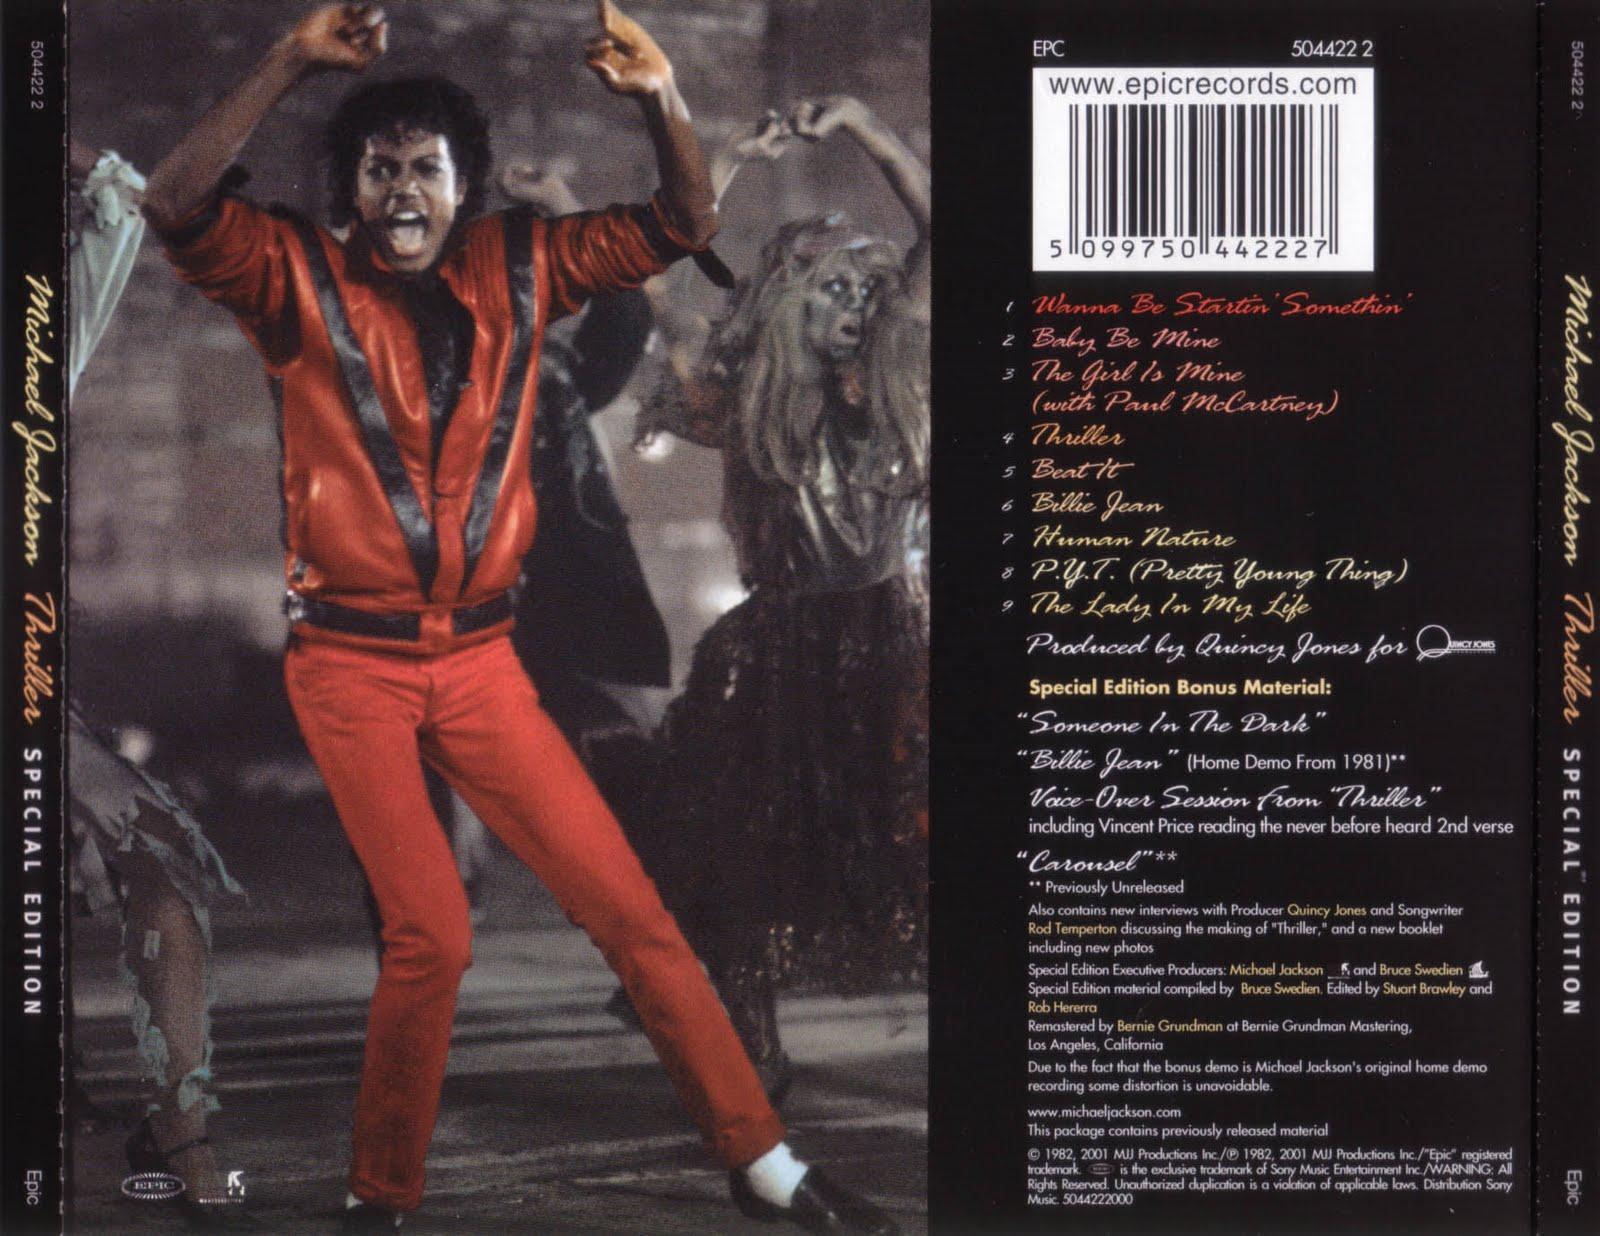 http://1.bp.blogspot.com/_9hpmRuuWki0/TMx5TOQ-psI/AAAAAAAAAYM/nPwgCbSDVQI/s1600/Michael_Jackson-Thriller_(Special_Edition)-Trasera.jpg